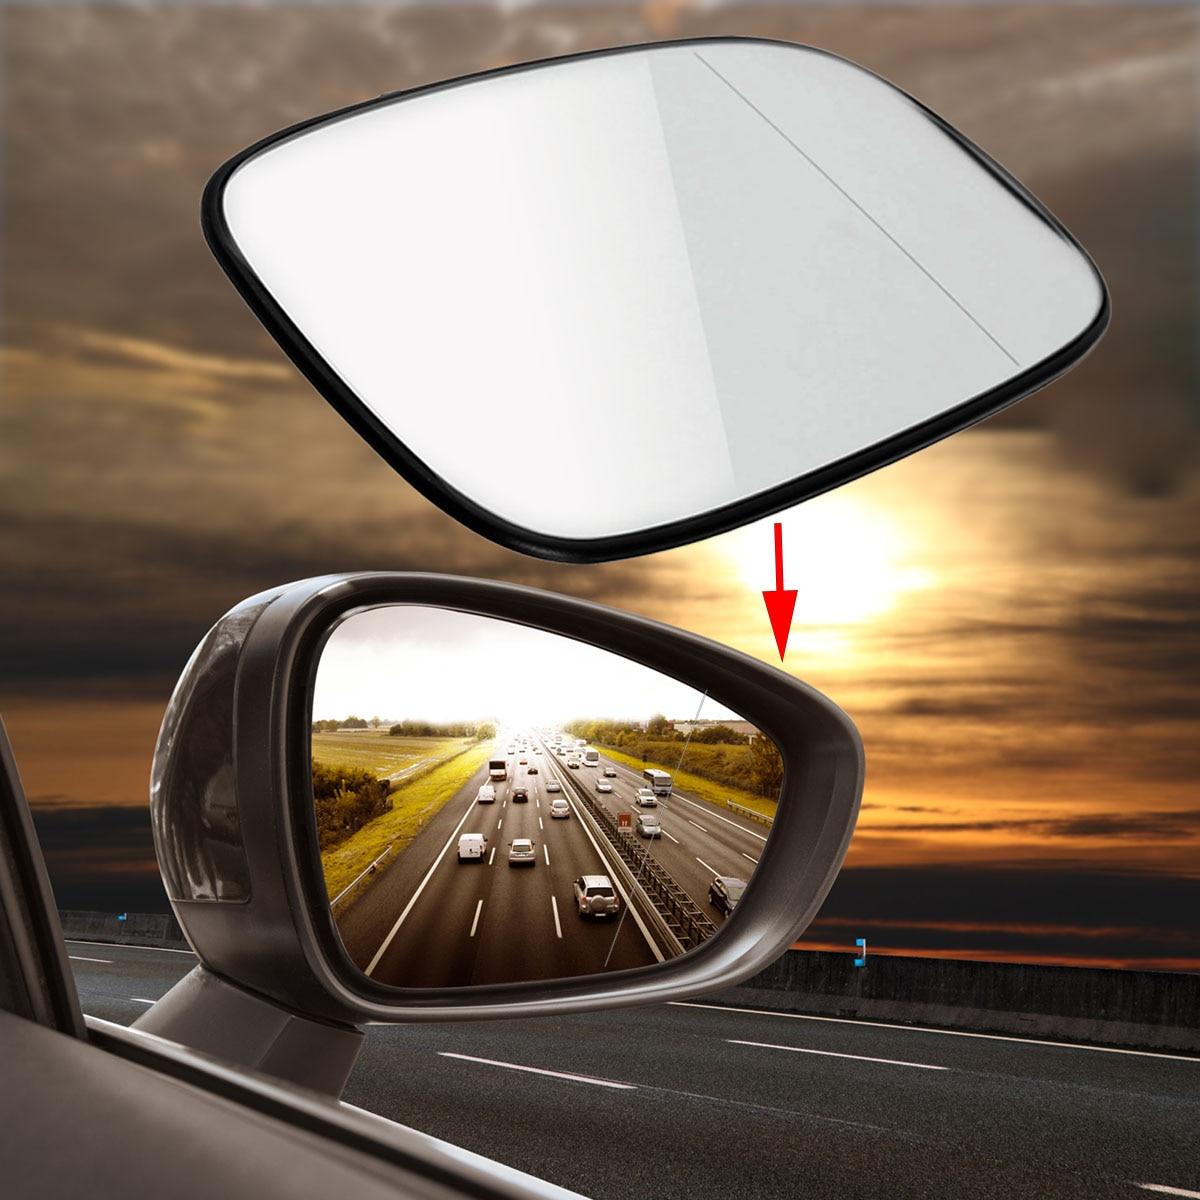 Toyota Sienna 2010-2018 Owners Manual: Adjusting the steeringwheel and mirrors